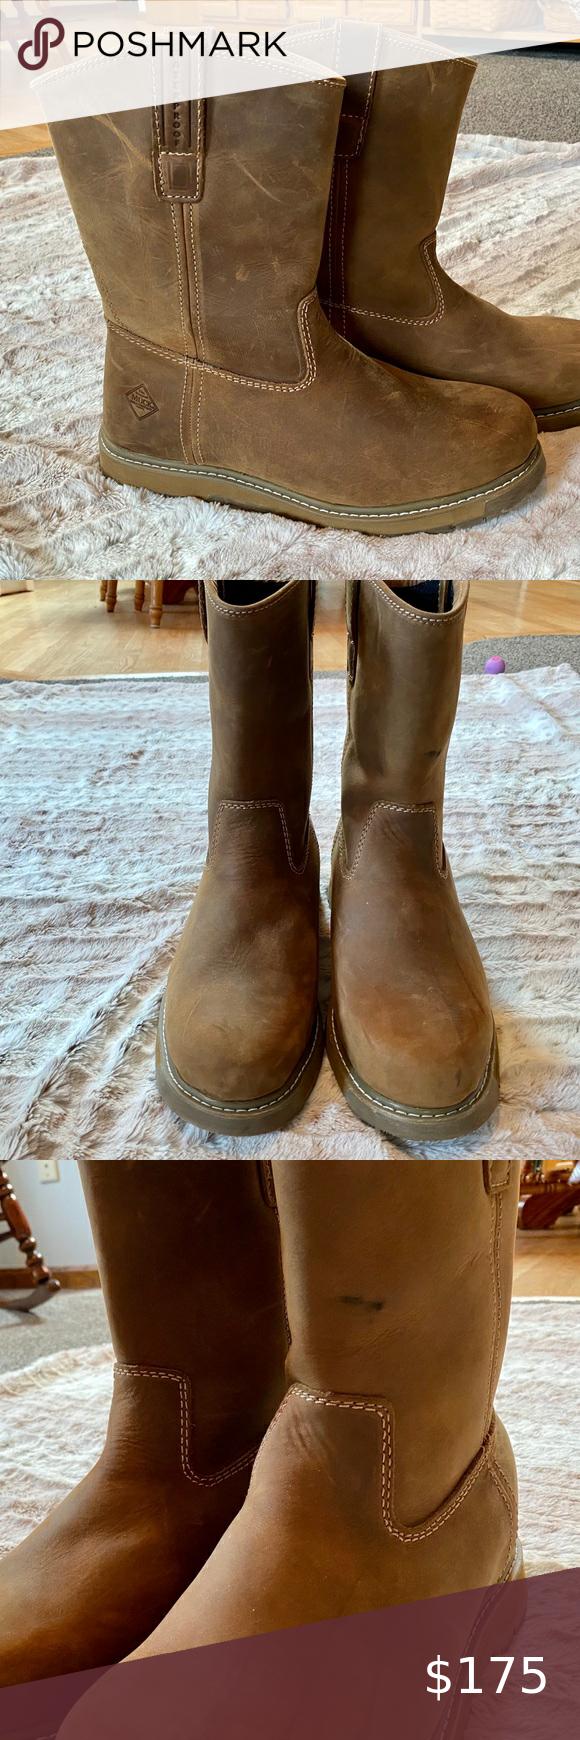 Snakeskin cowboy boots